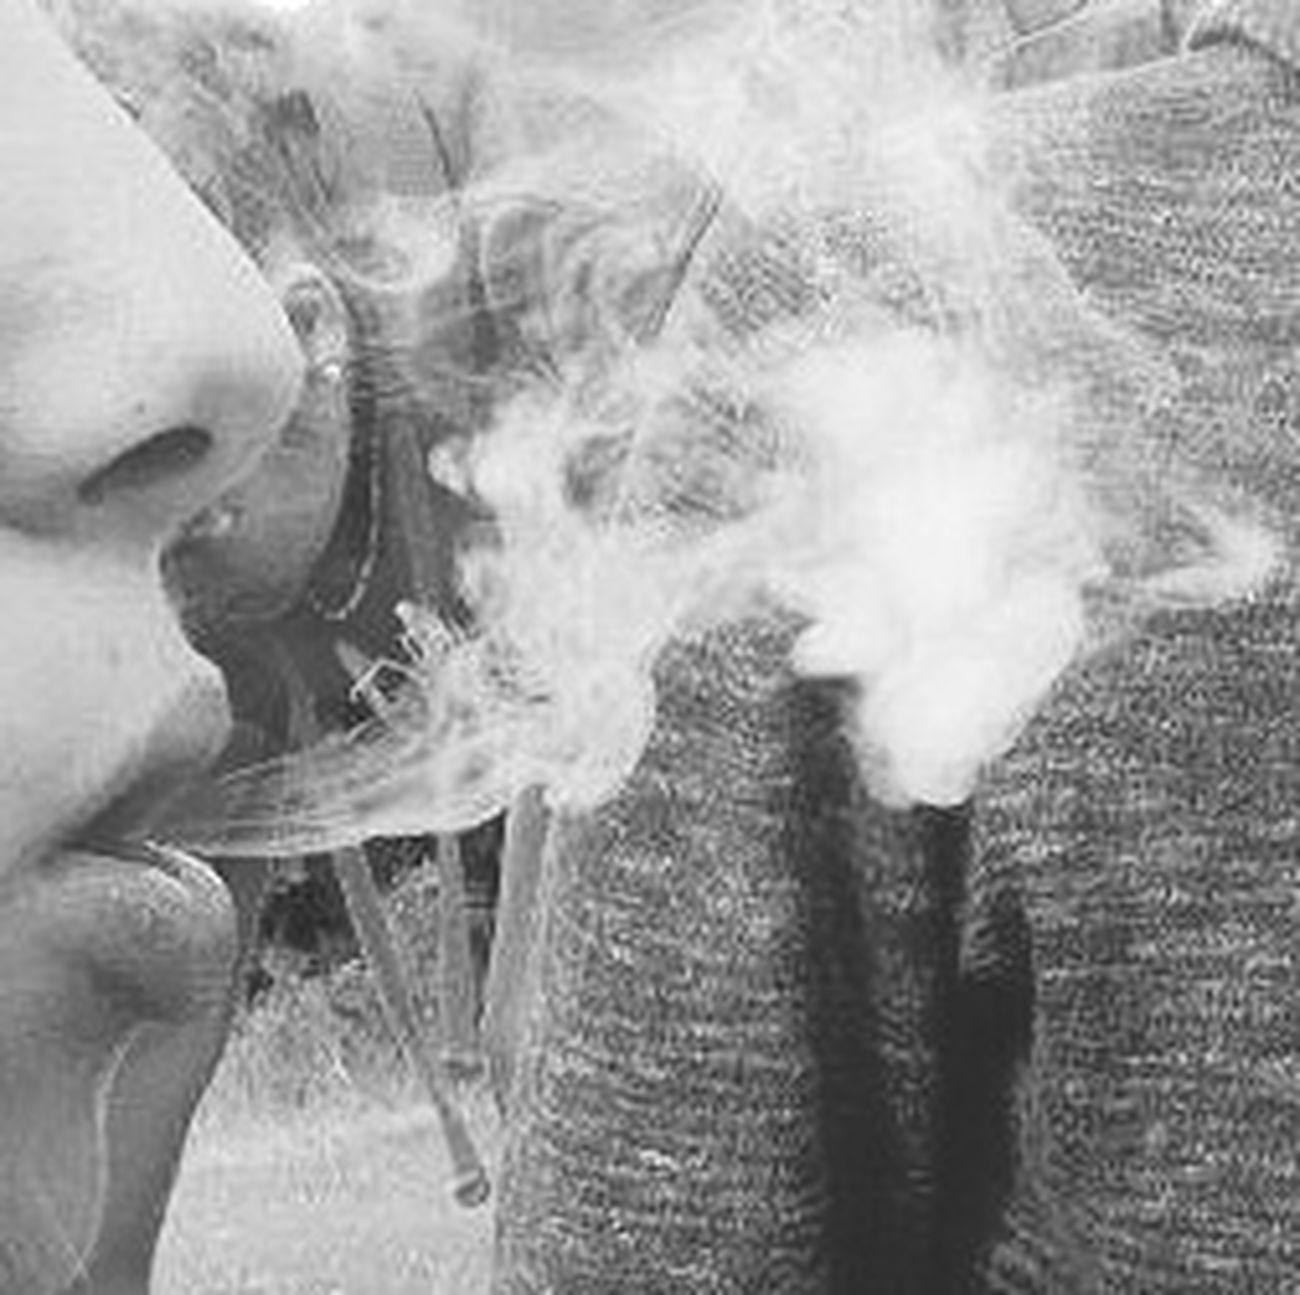 Chicha Party Fumée Onsemetbien